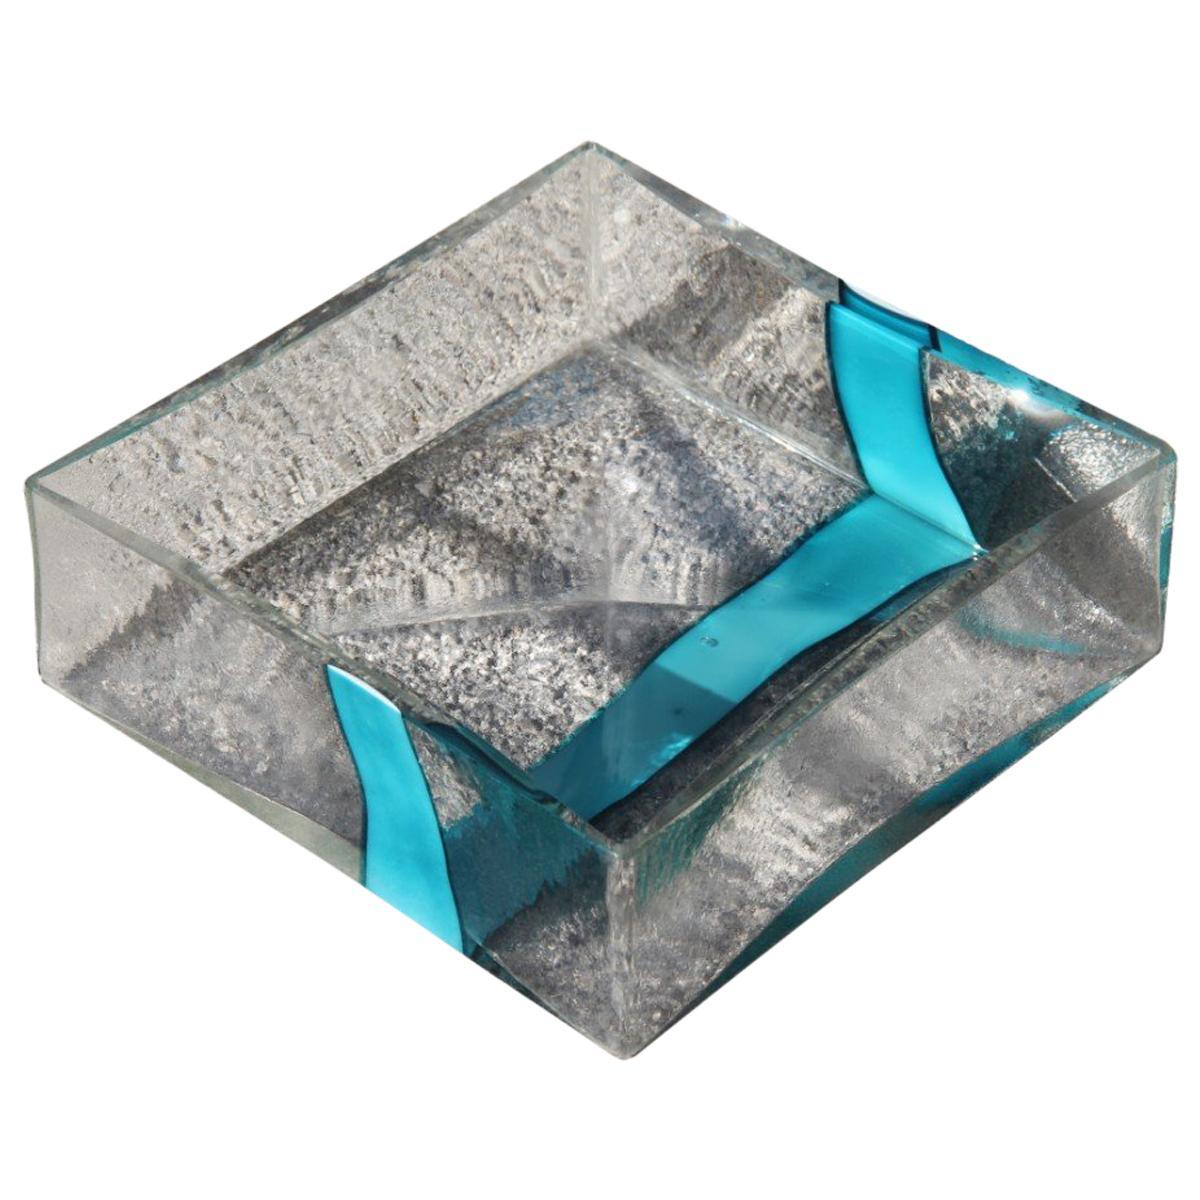 Pierre Cardin for Venini 1970 Square Transparent Murano Bowl Light Blue Glass